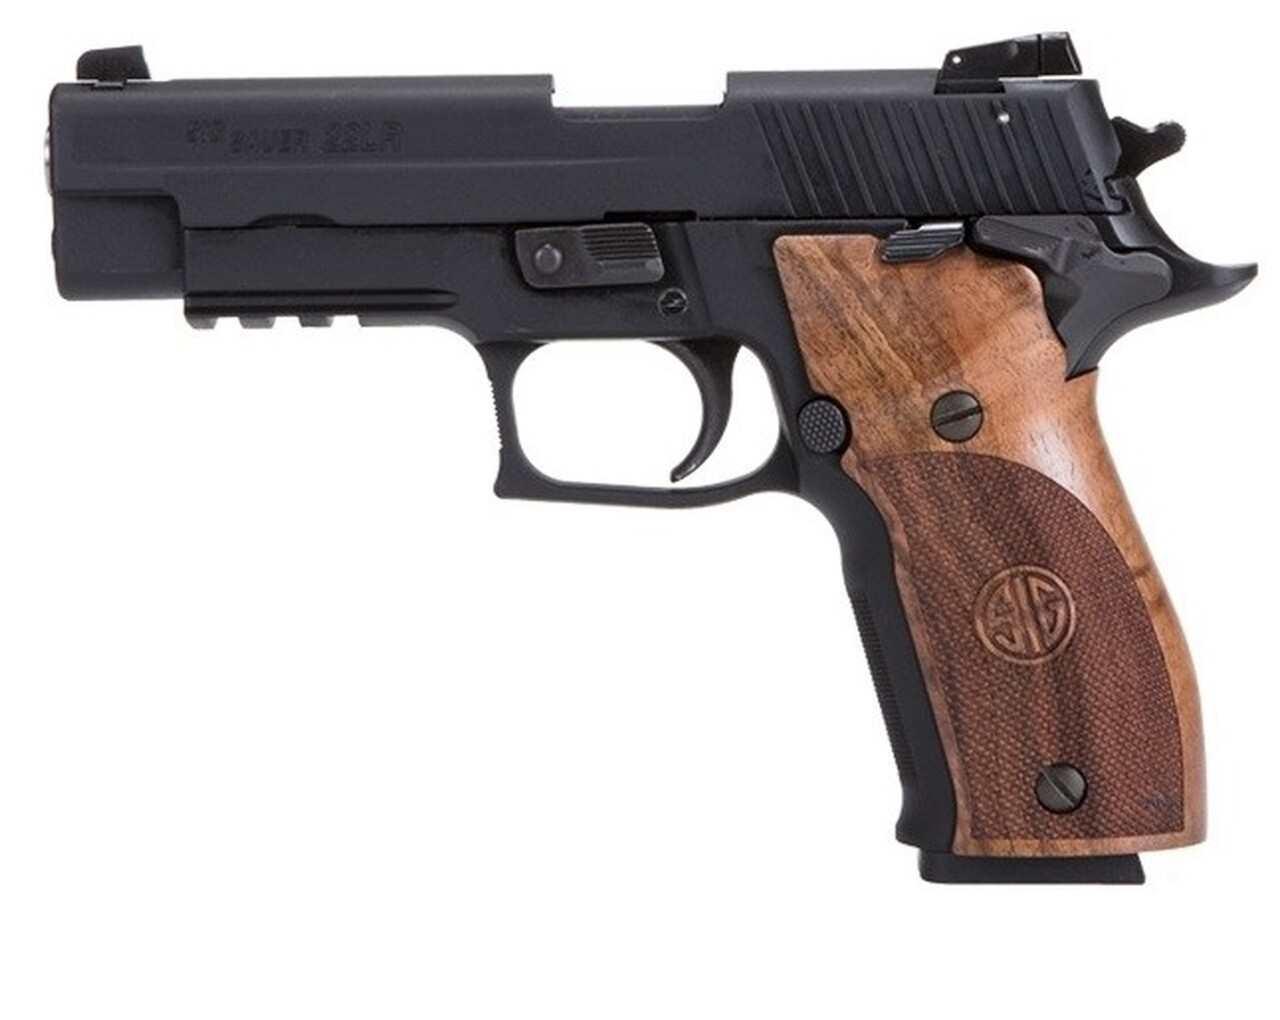 SIG SAUER P226 BLACK .22 LR 4.5-INCH SINGLE ACTION